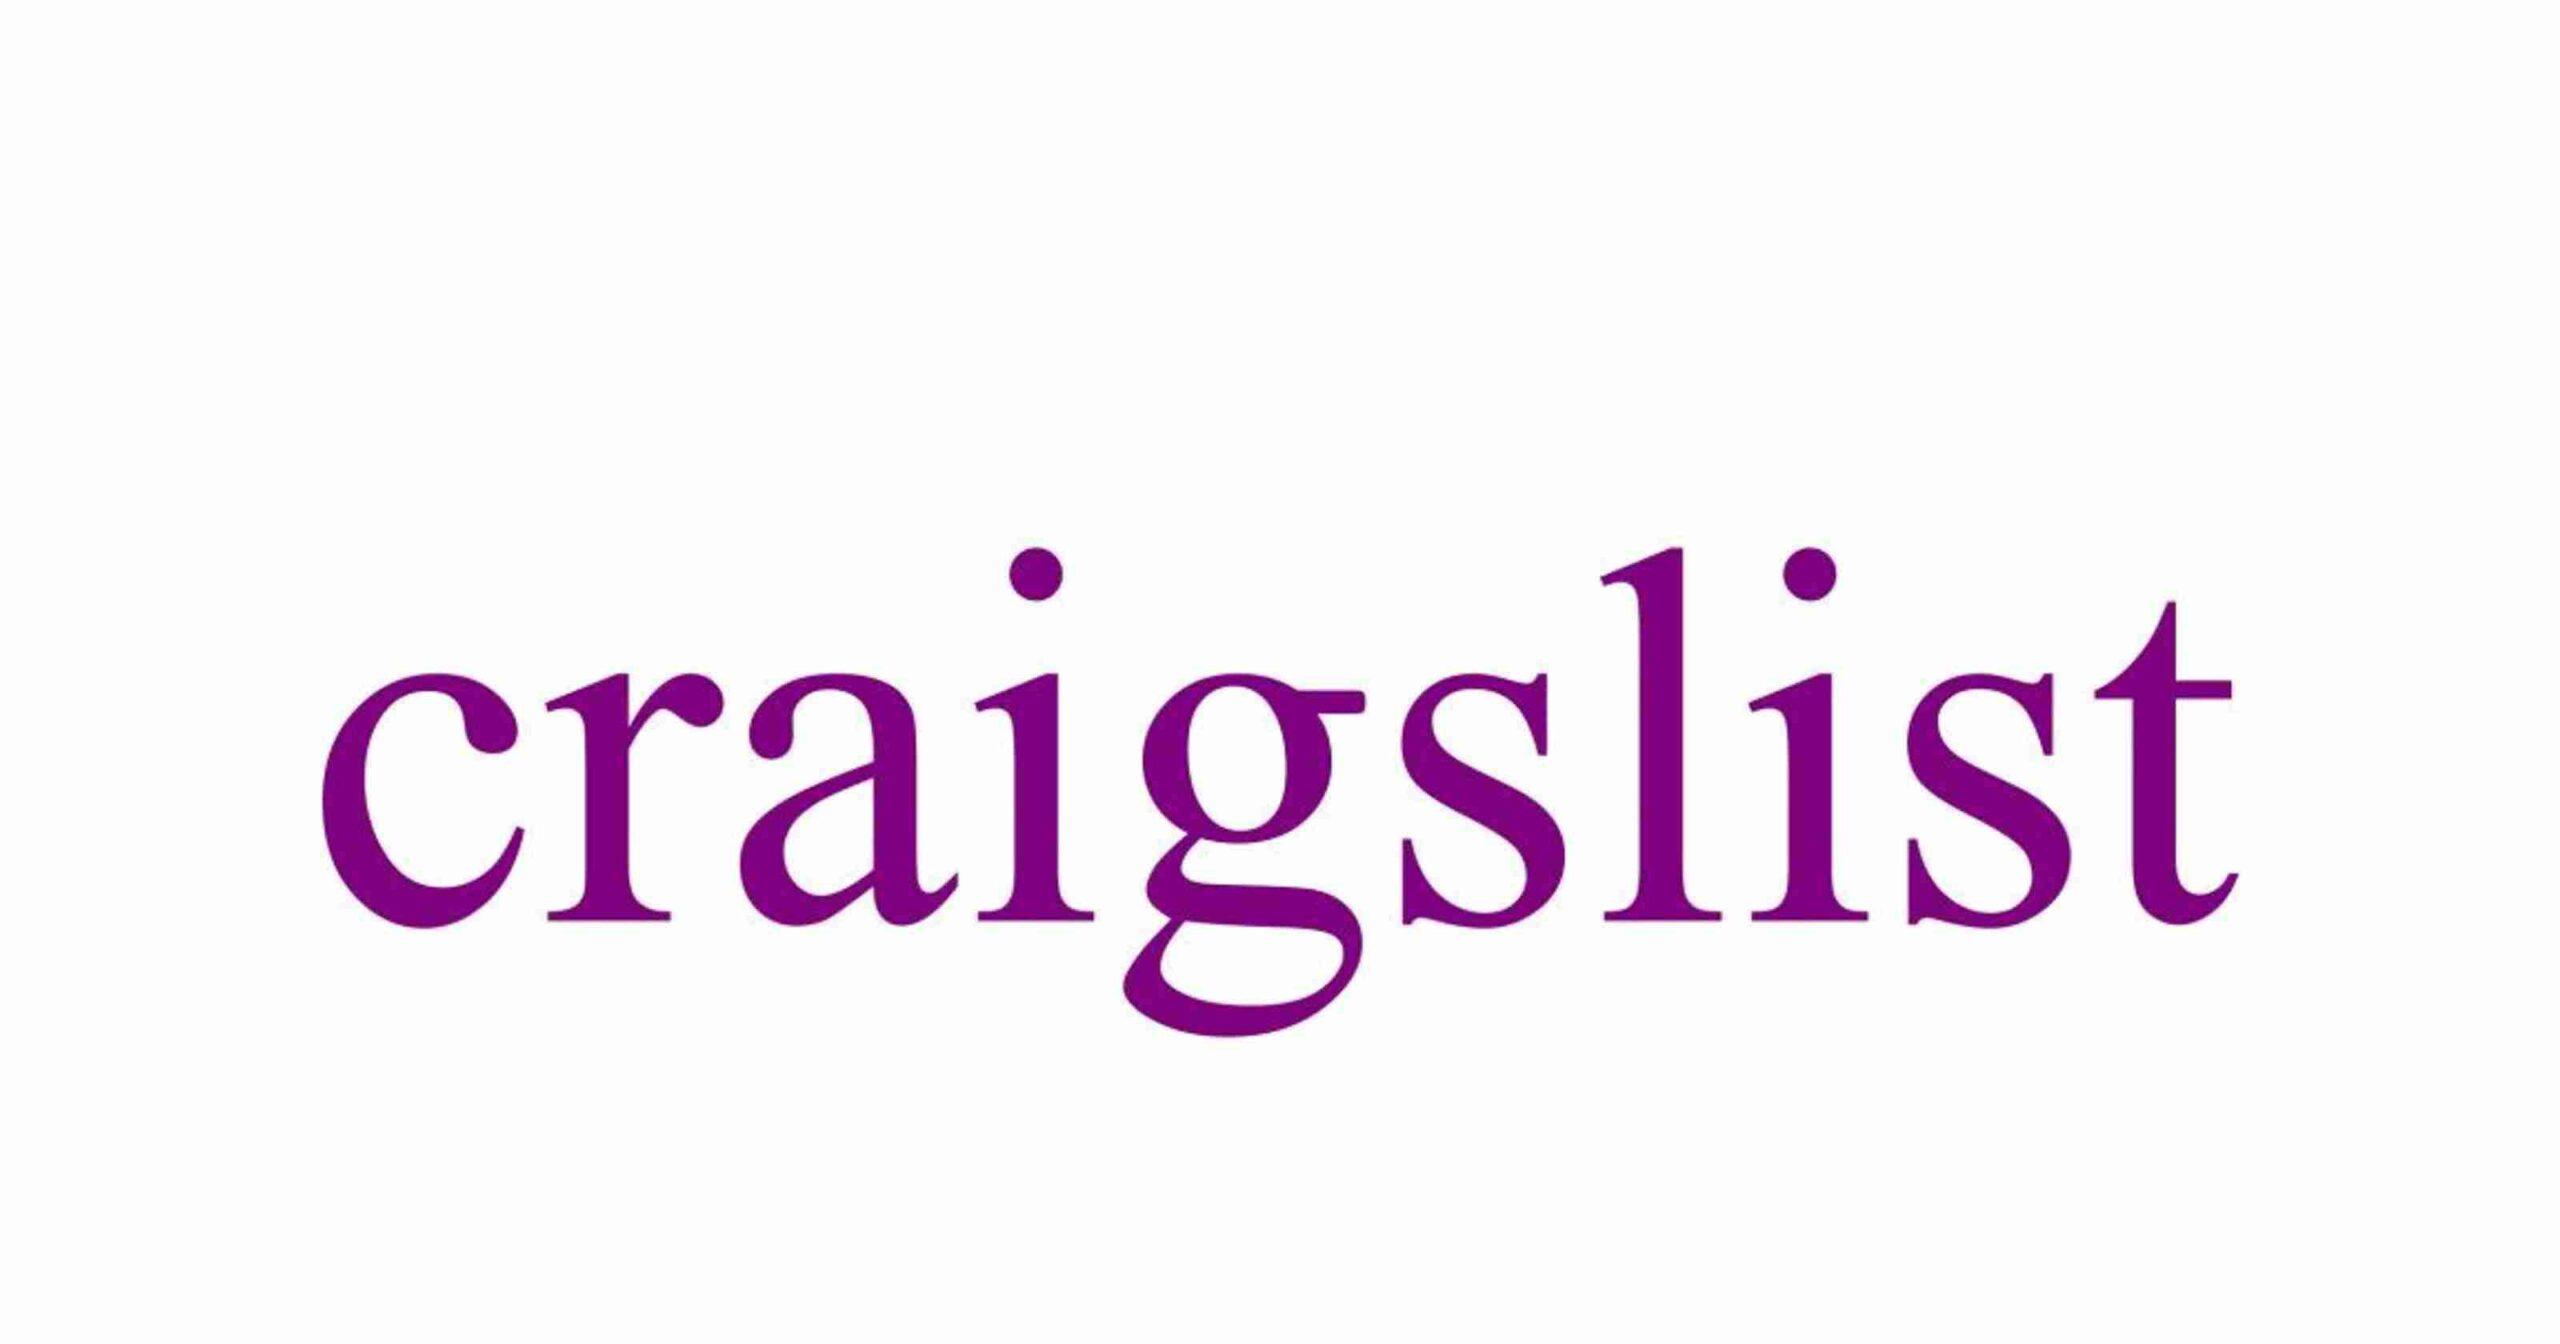 Craigslist customer service: phone number, hours & reviews